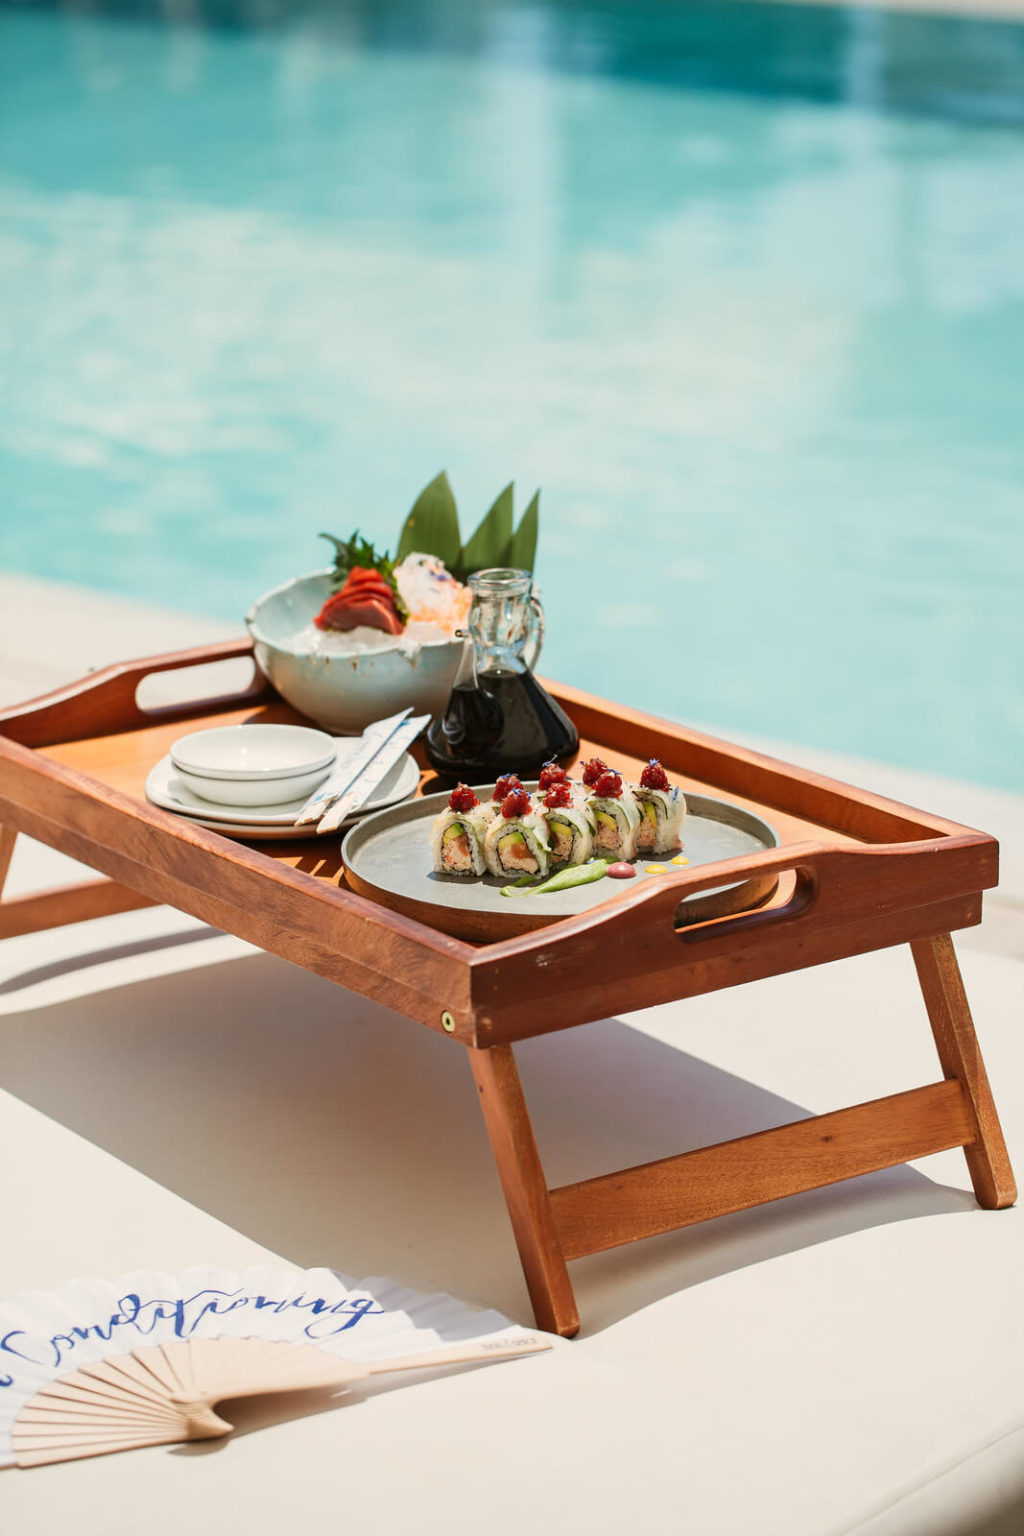 https://www.white-ibiza.com/wp-content/uploads/2020/03/white-ibiza-restaurants-nikki-beach-ibiza-2020-02-1024x1536.jpg